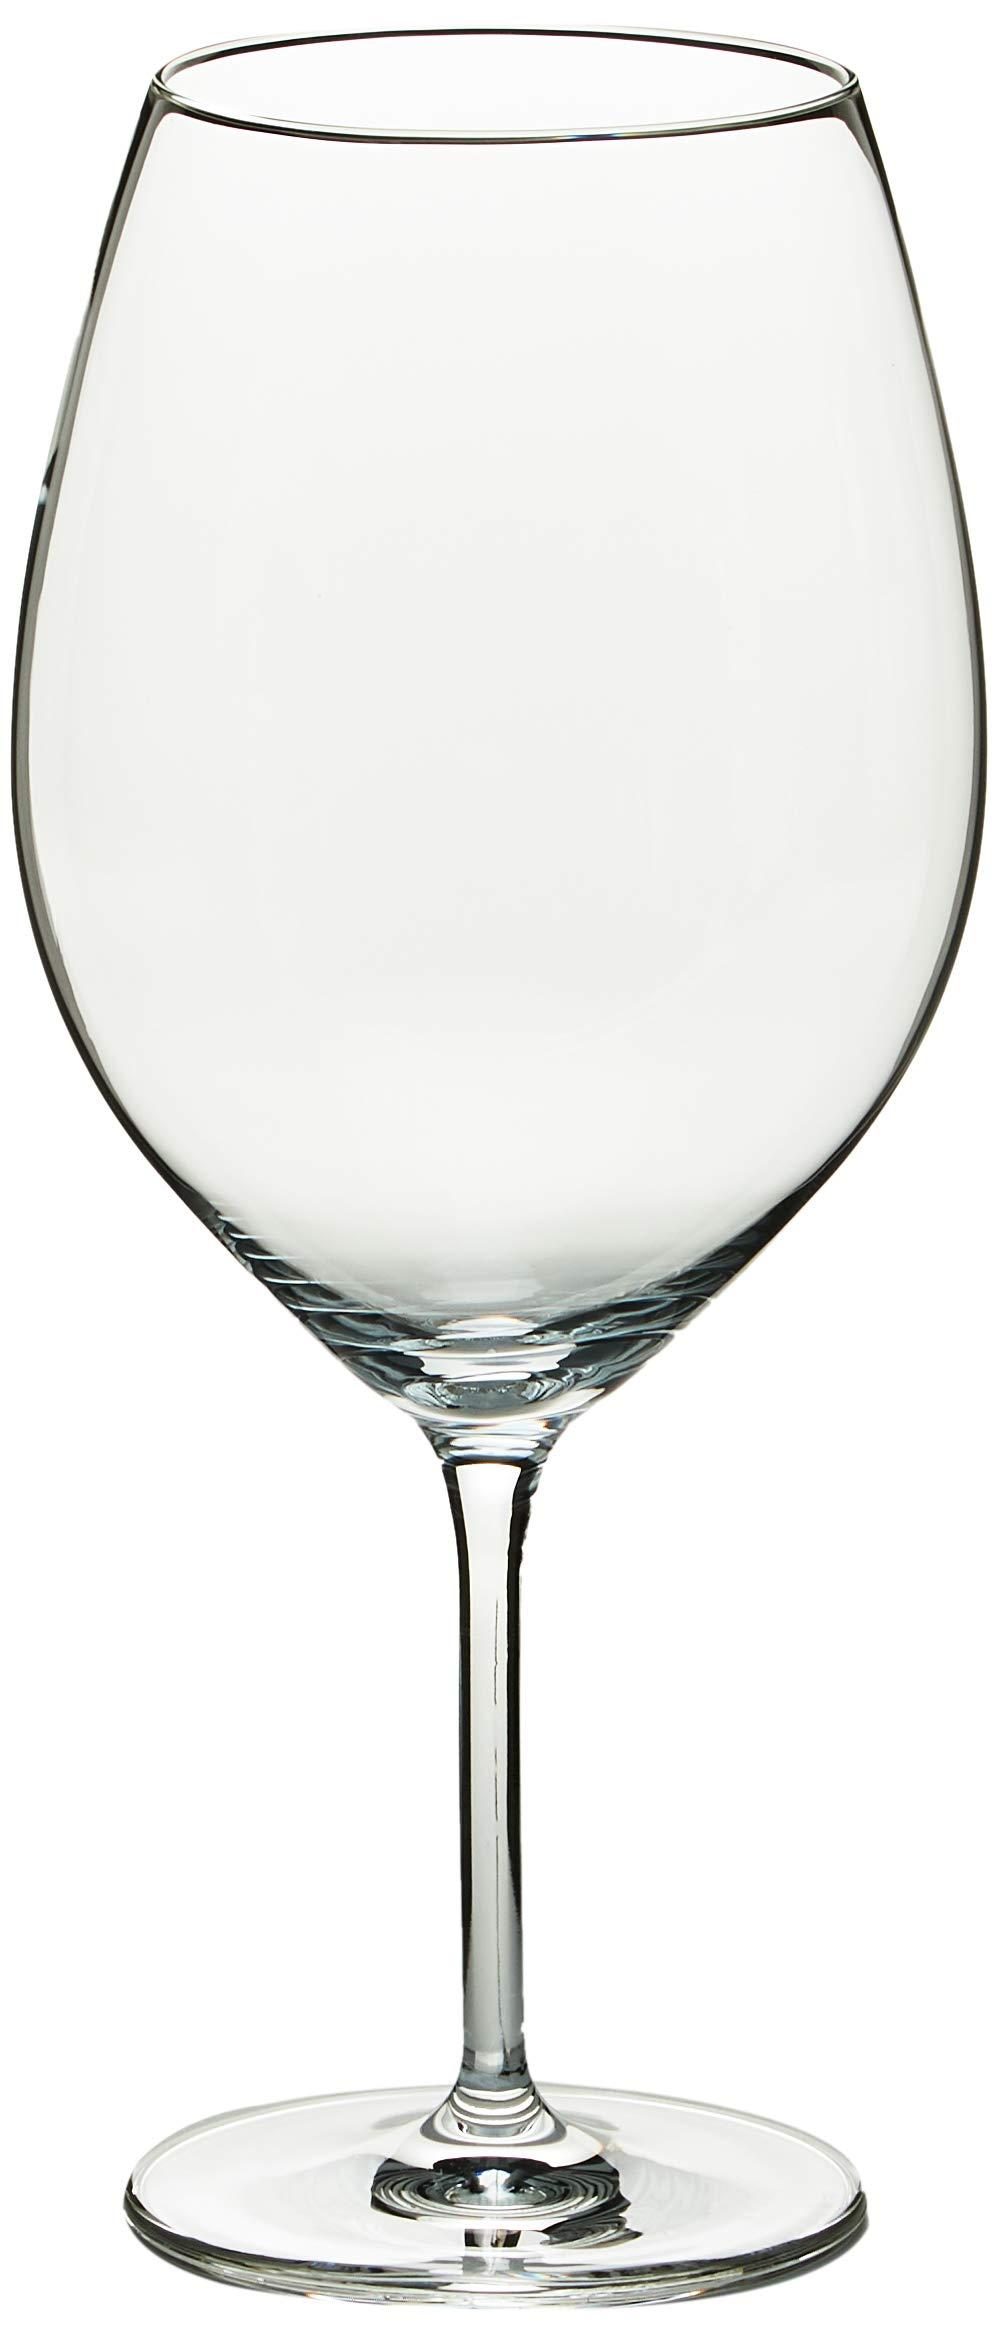 Schott Zwiesel Tritan Crystal Glass Cru Classic Stemware Collection Bordeaux Red Wine Glass, 27.9-Ounce, Set of 6